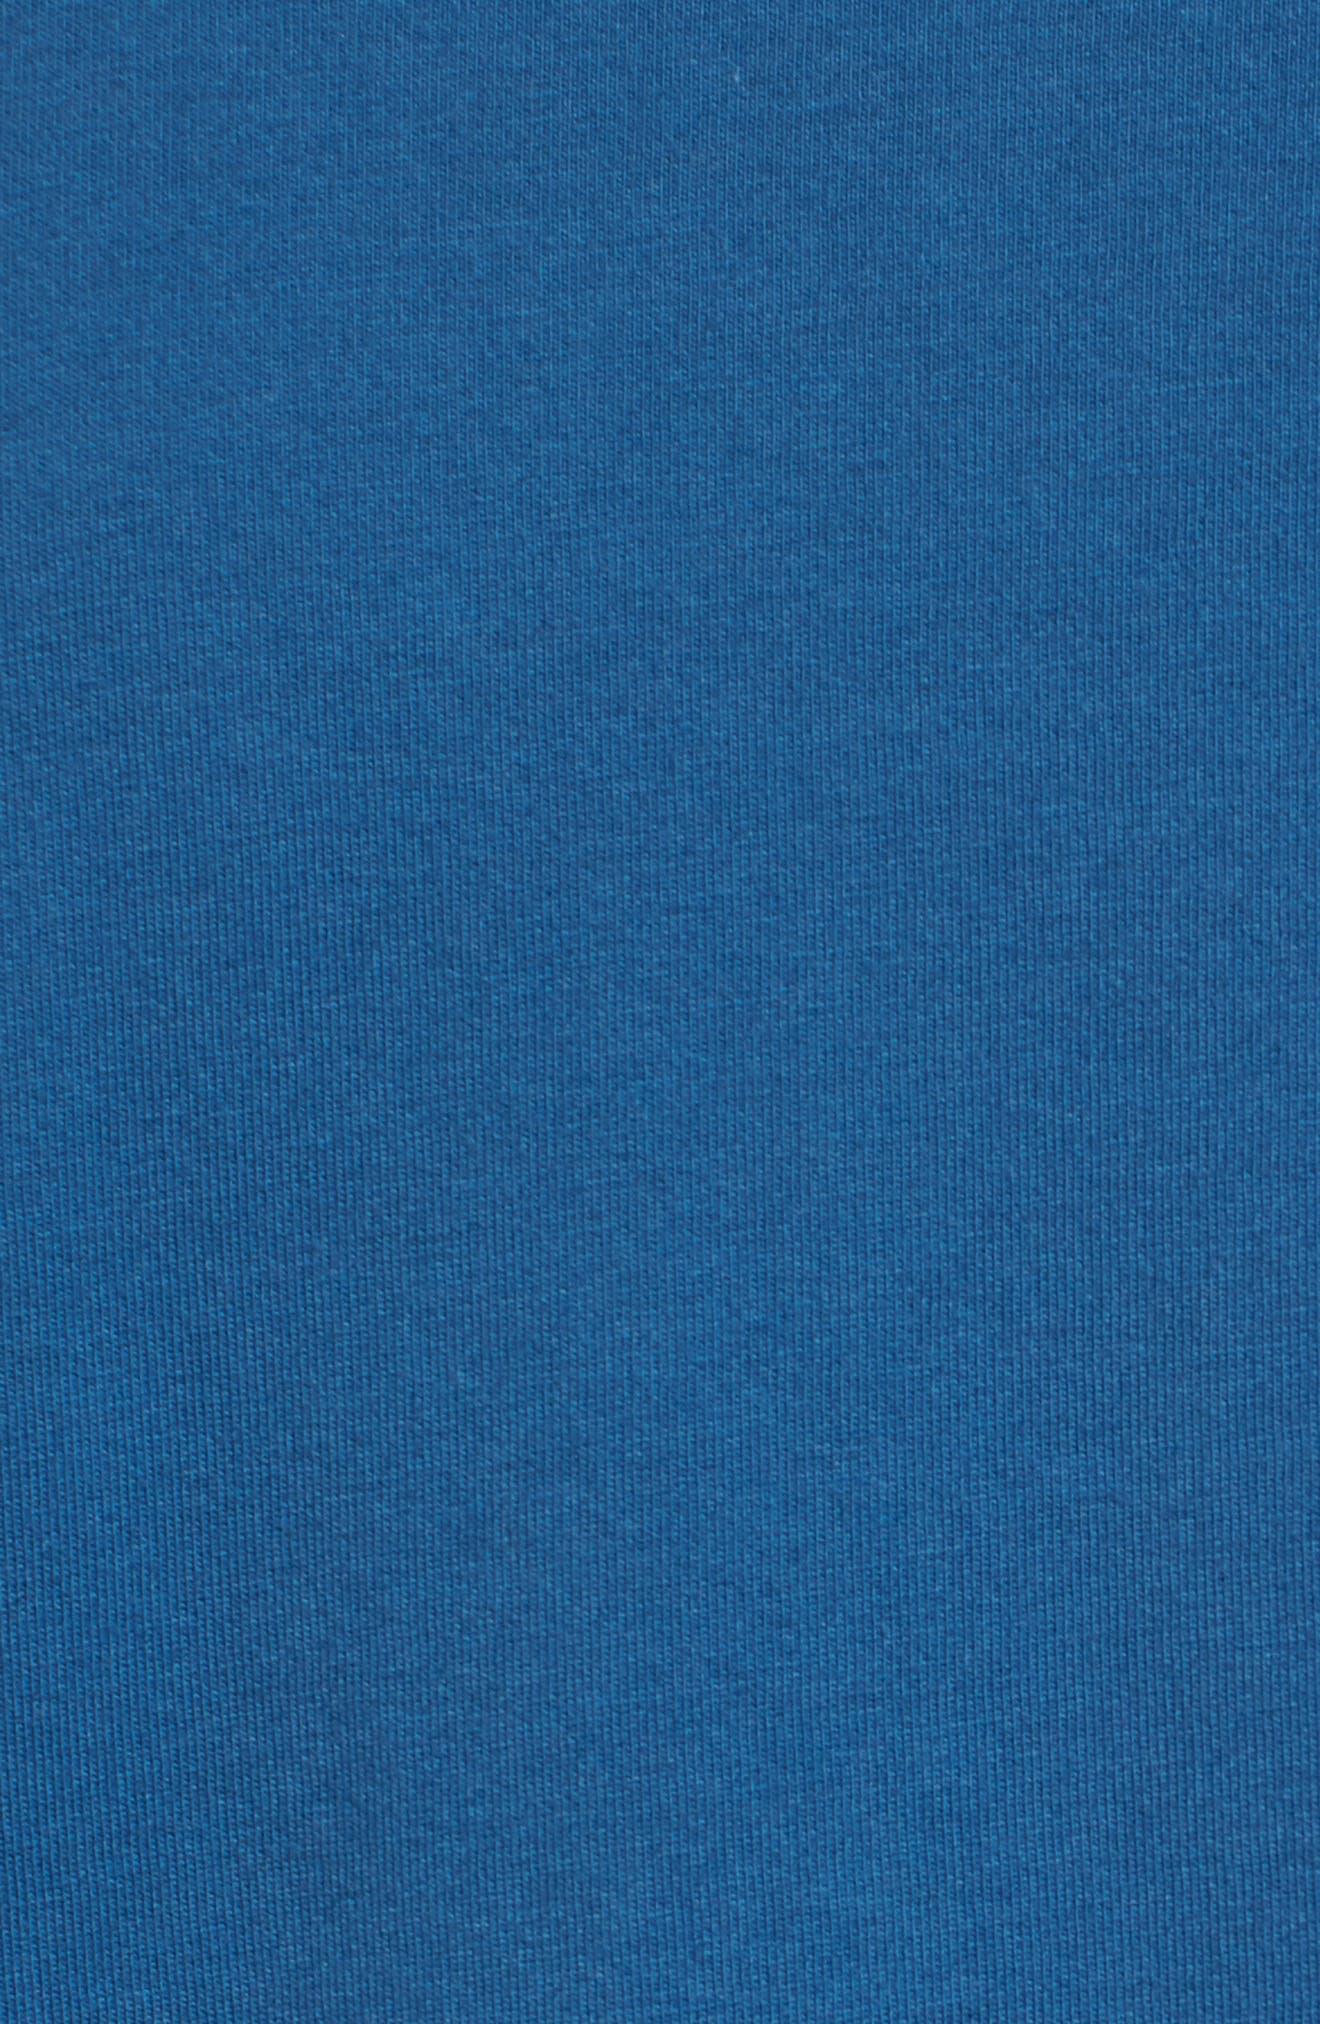 Waterline Graphic T-Shirt,                             Alternate thumbnail 3, color,                             Sea Blue